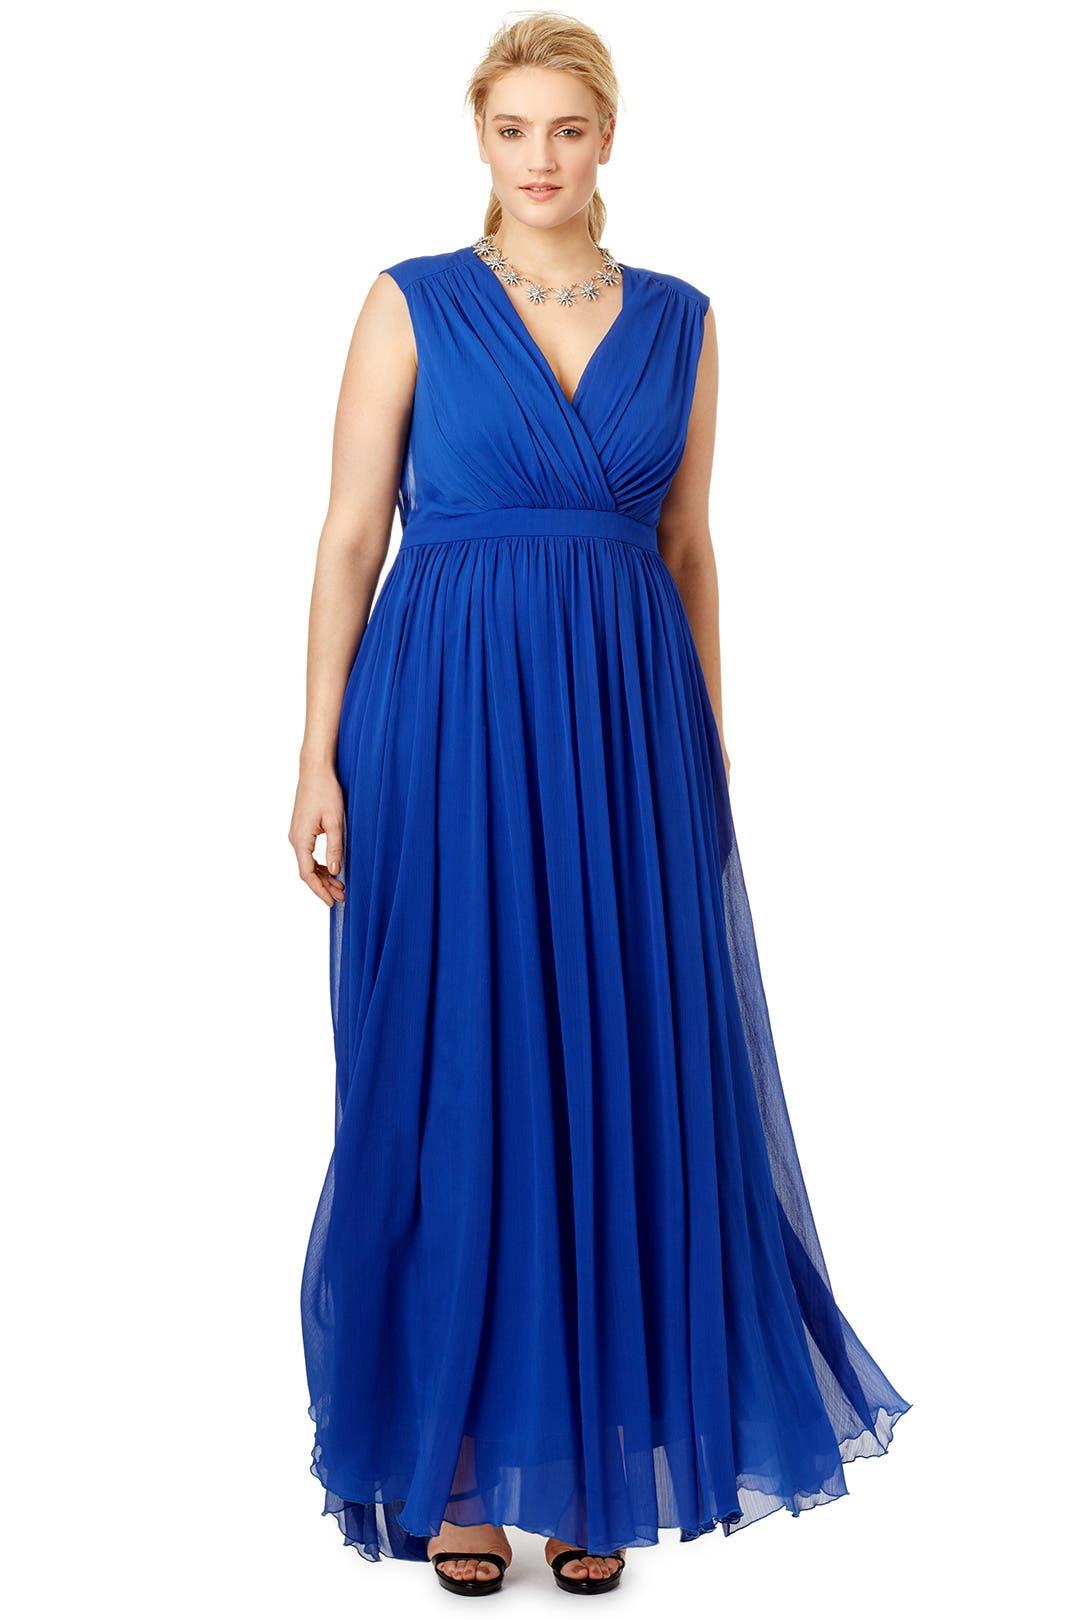 Badgley Mischka Mother Of The Bride Dresses - Wedding Dress Ideas